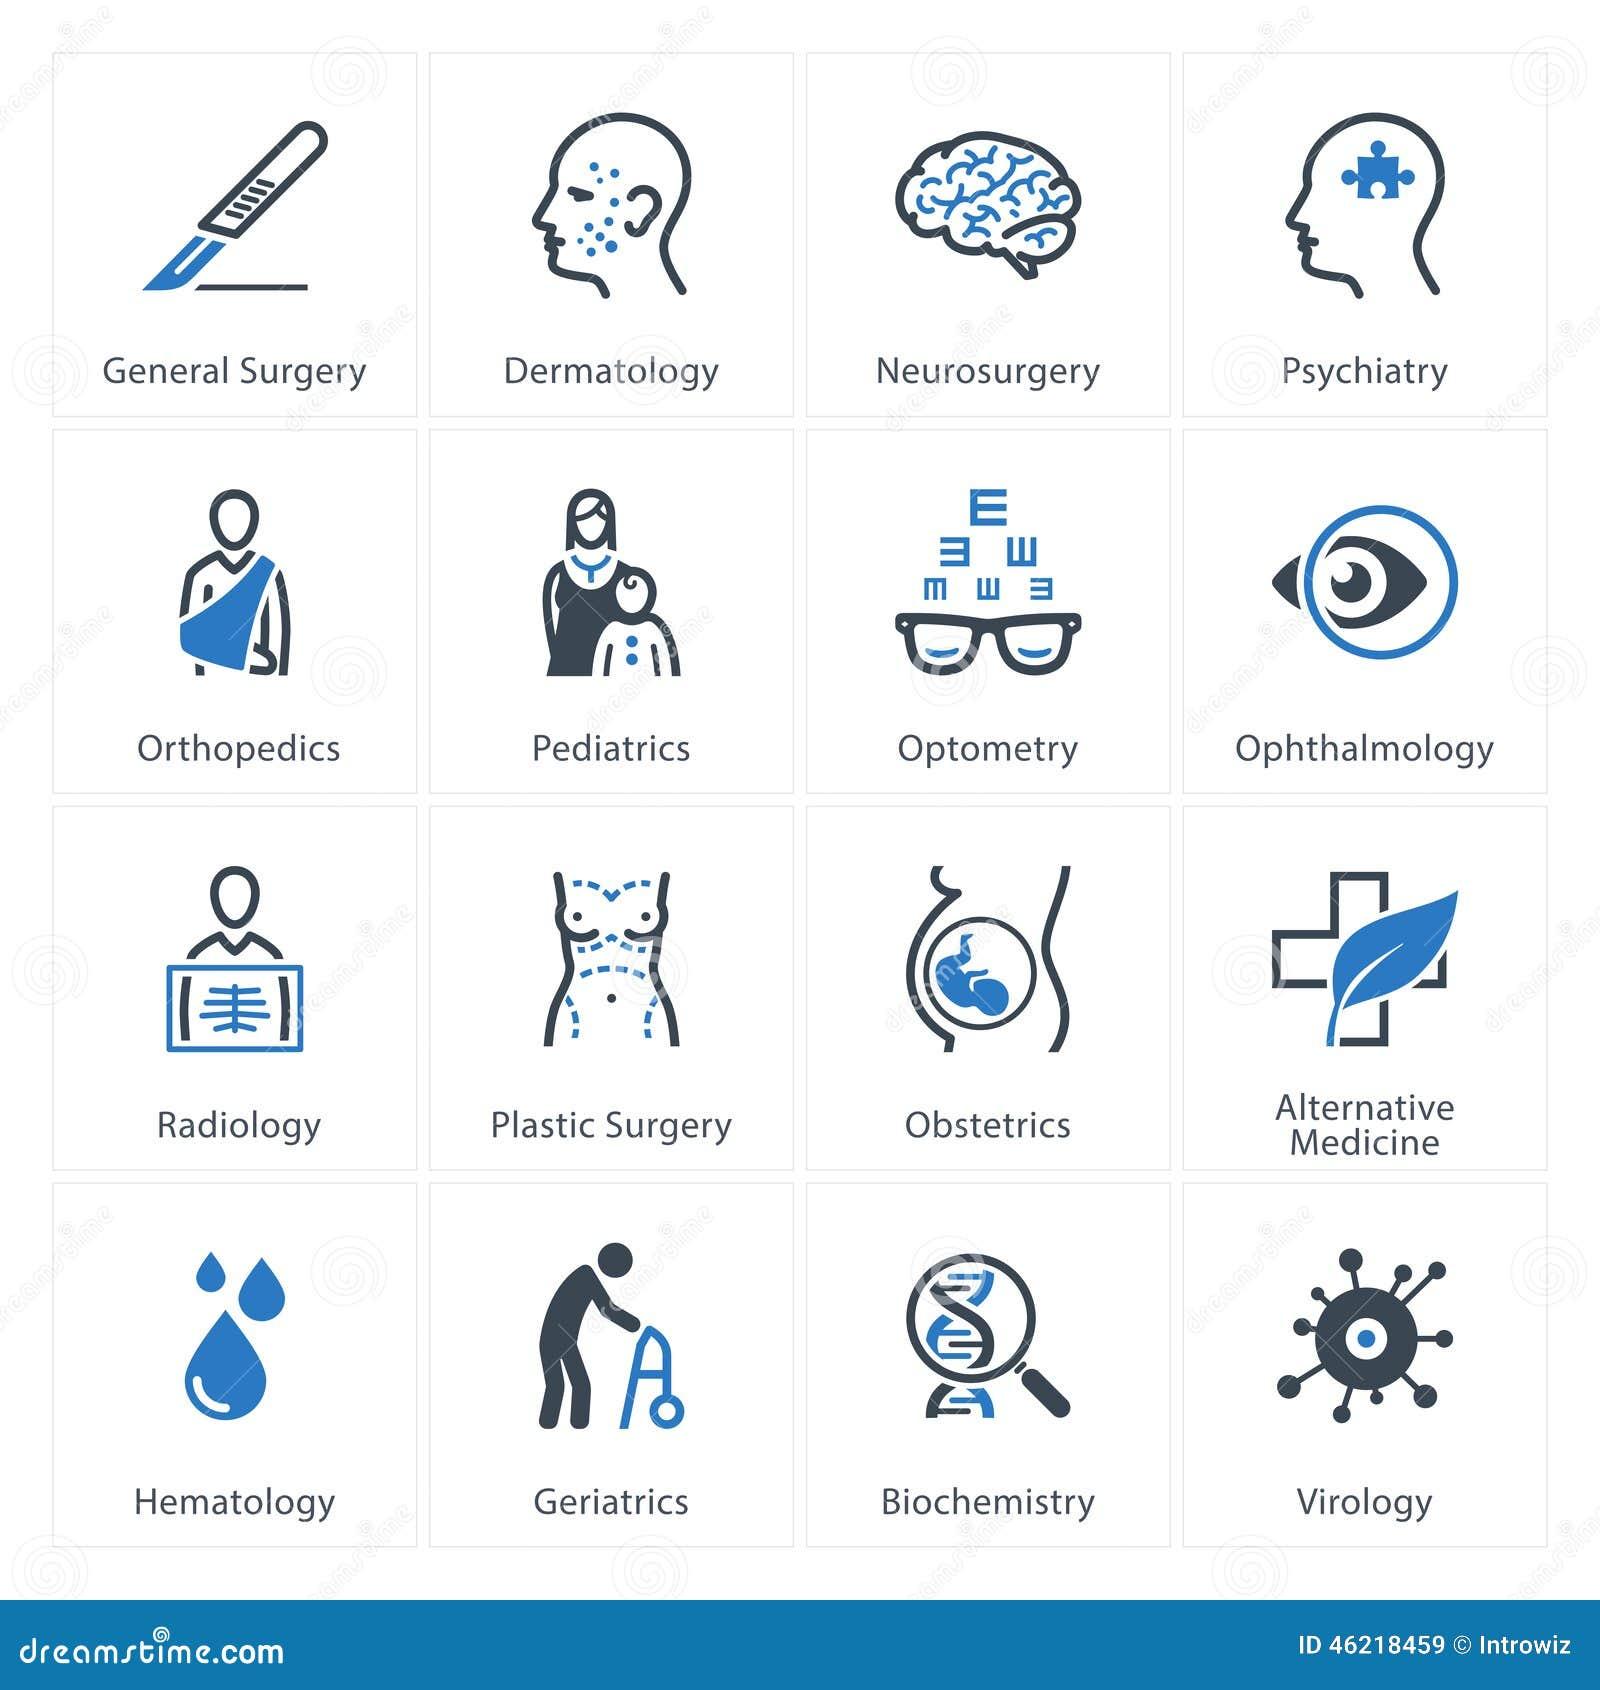 Specialties: Medical Specialties Icons Set 1